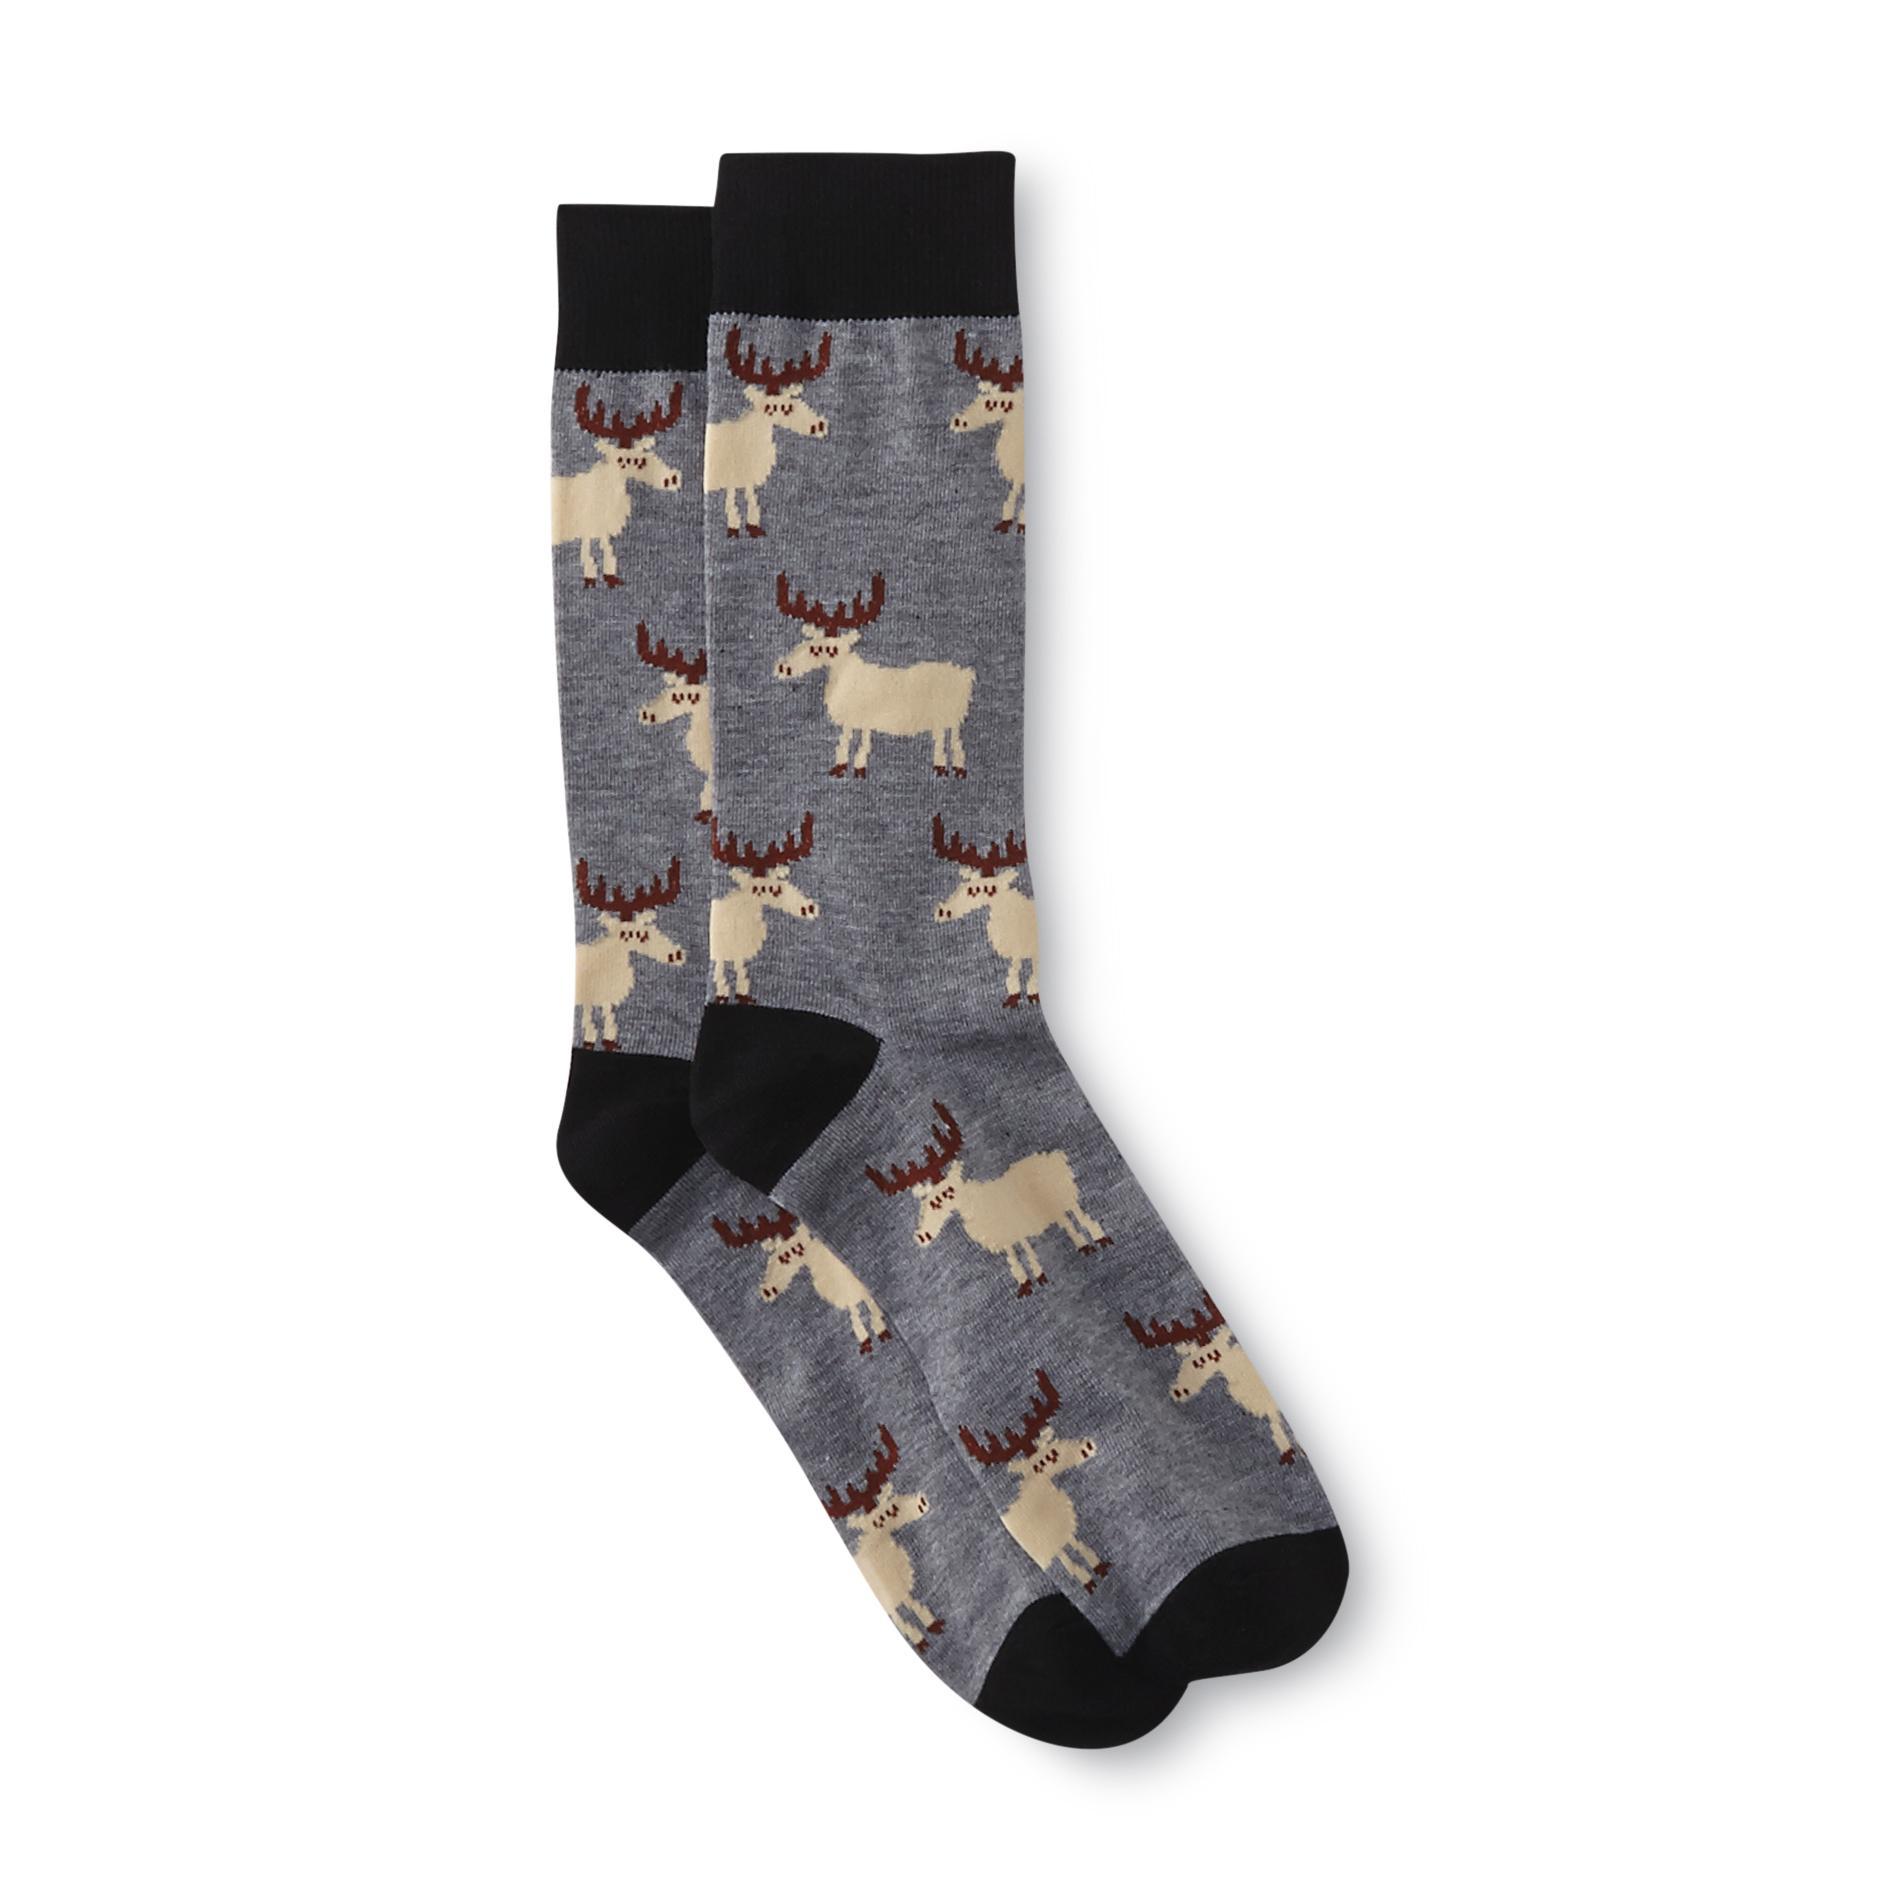 Joe Boxer Men's Christmas Crew Socks - Moose